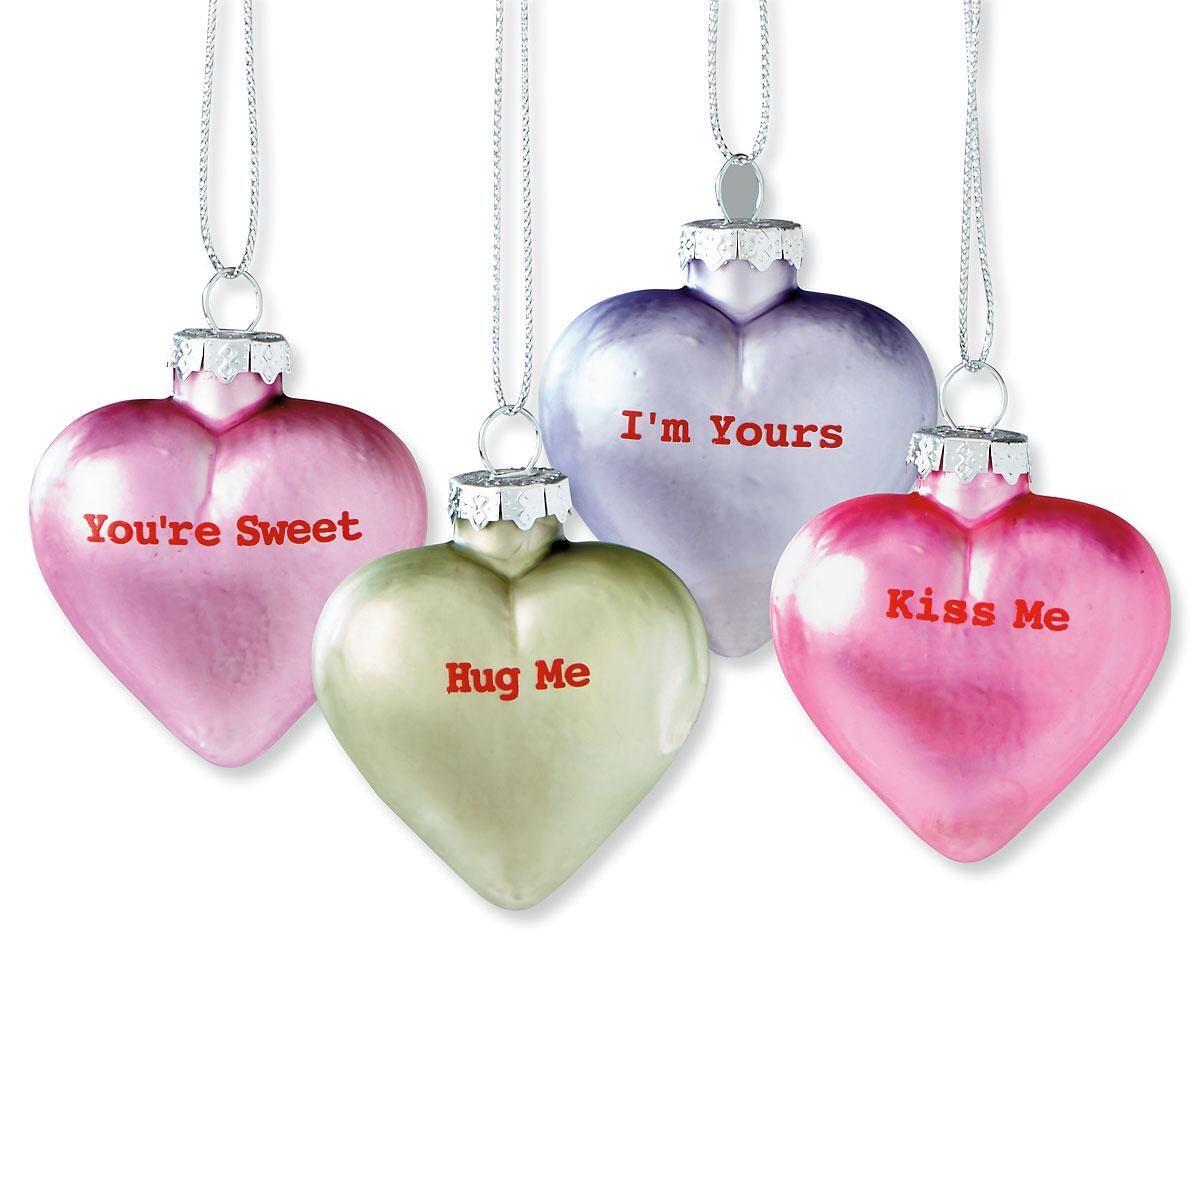 Conversation Heart Ornaments